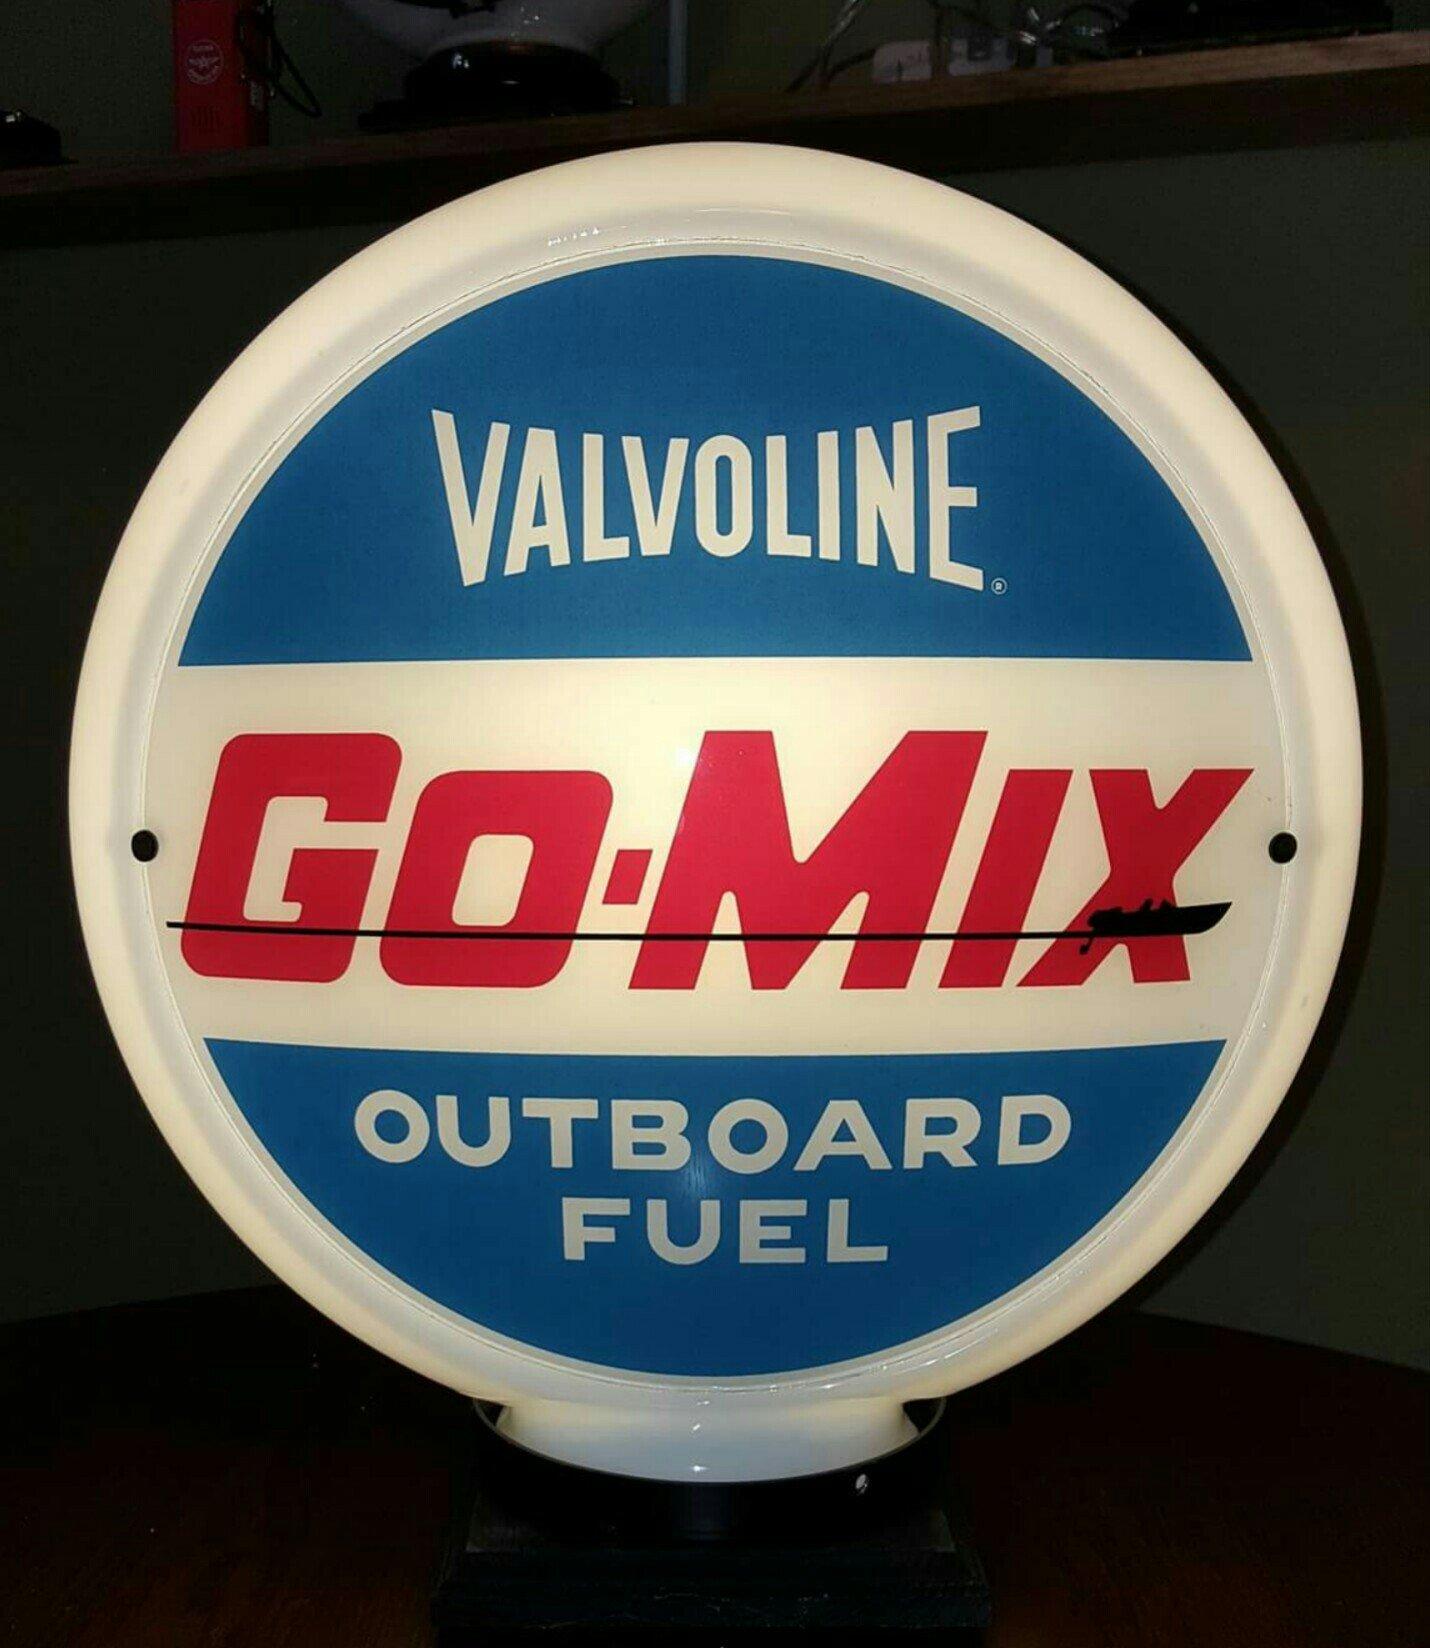 Valvolene Go Mix Outboard Fuel Vintage Gas Pump Globe